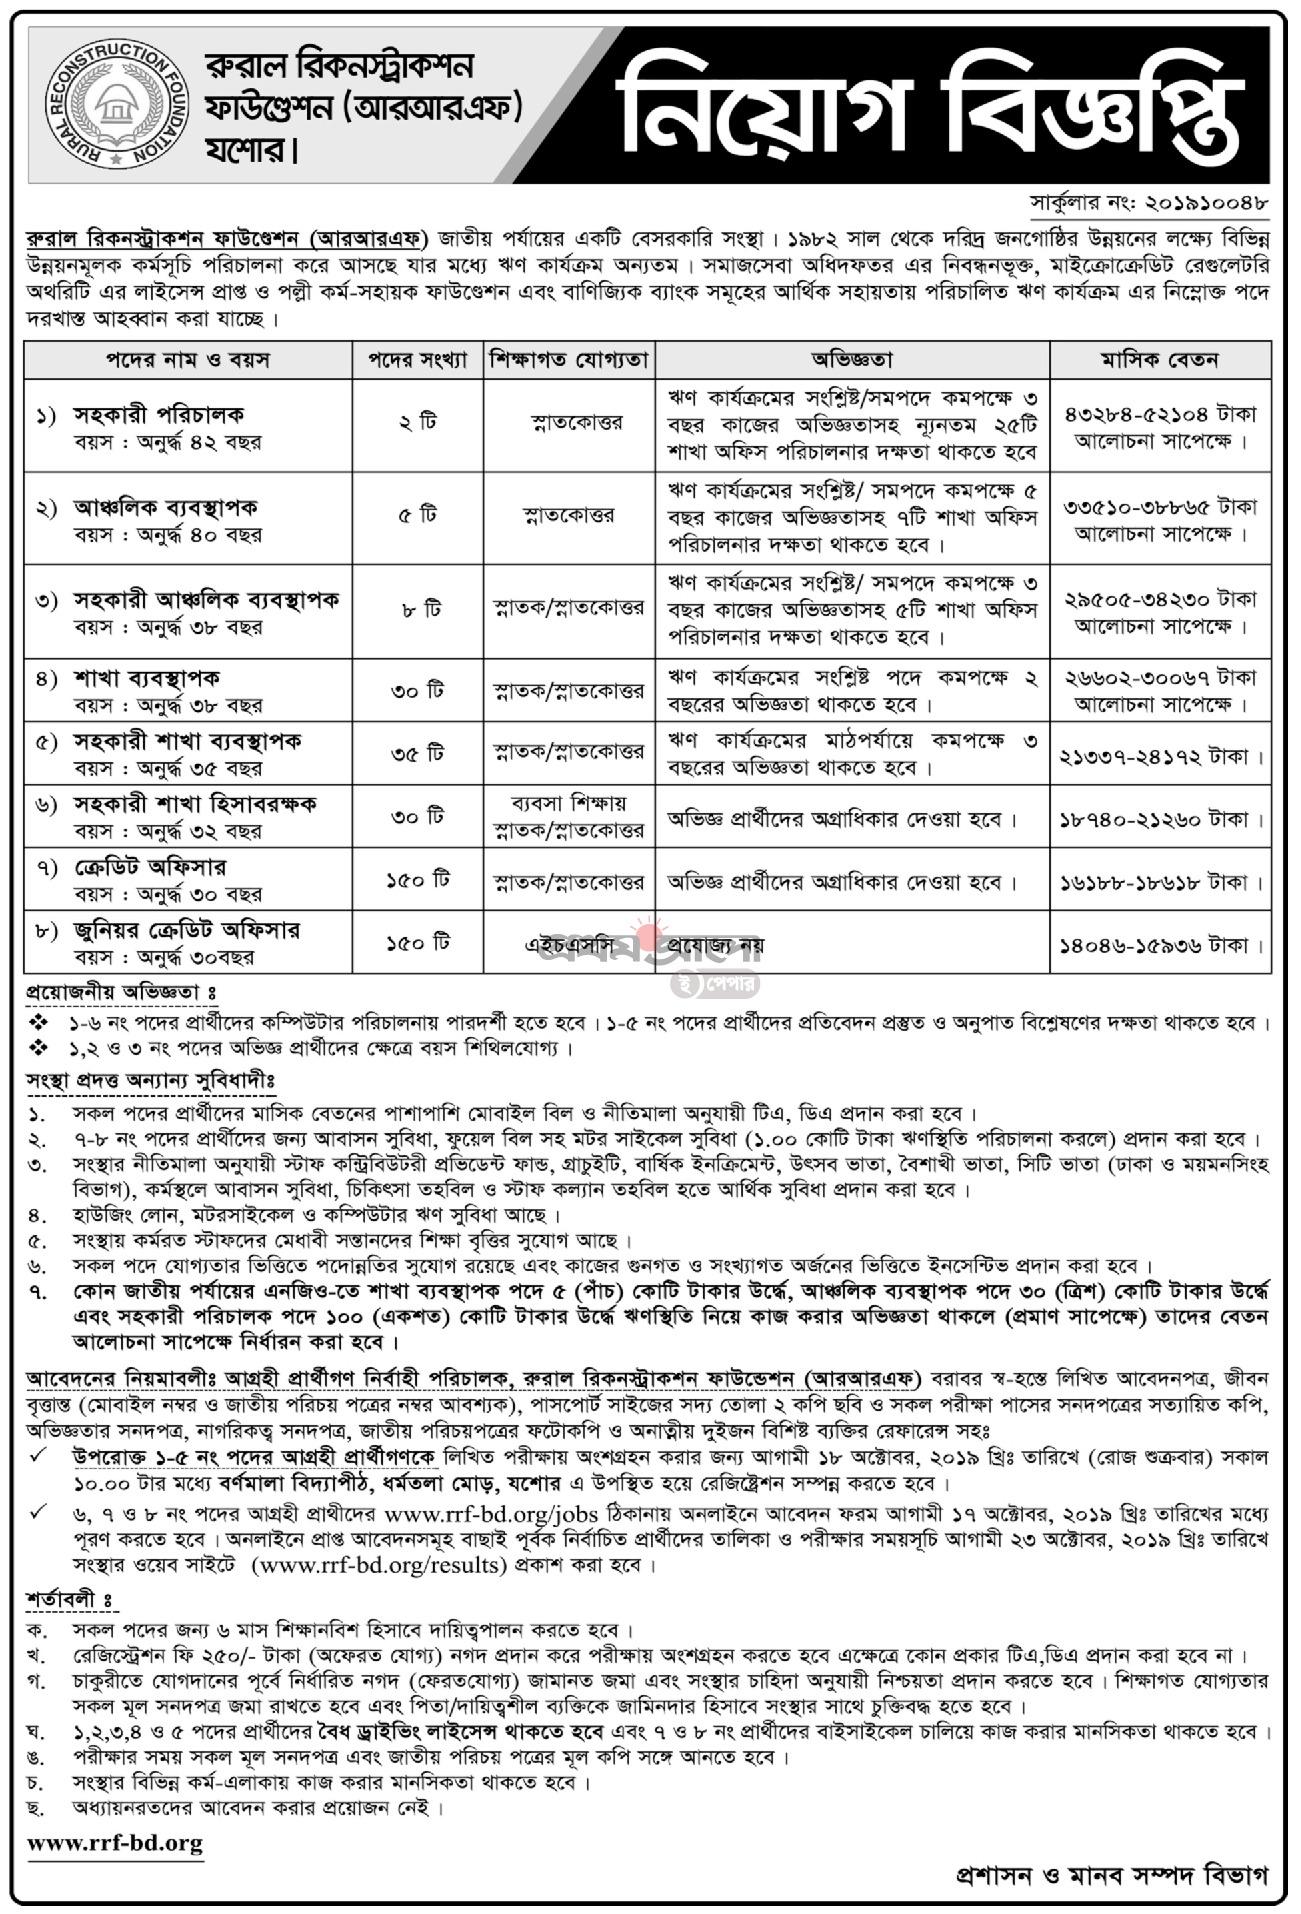 BD Jobs Rural Reconstruction Foundation RRF Job Circular 2019 NGO jobs